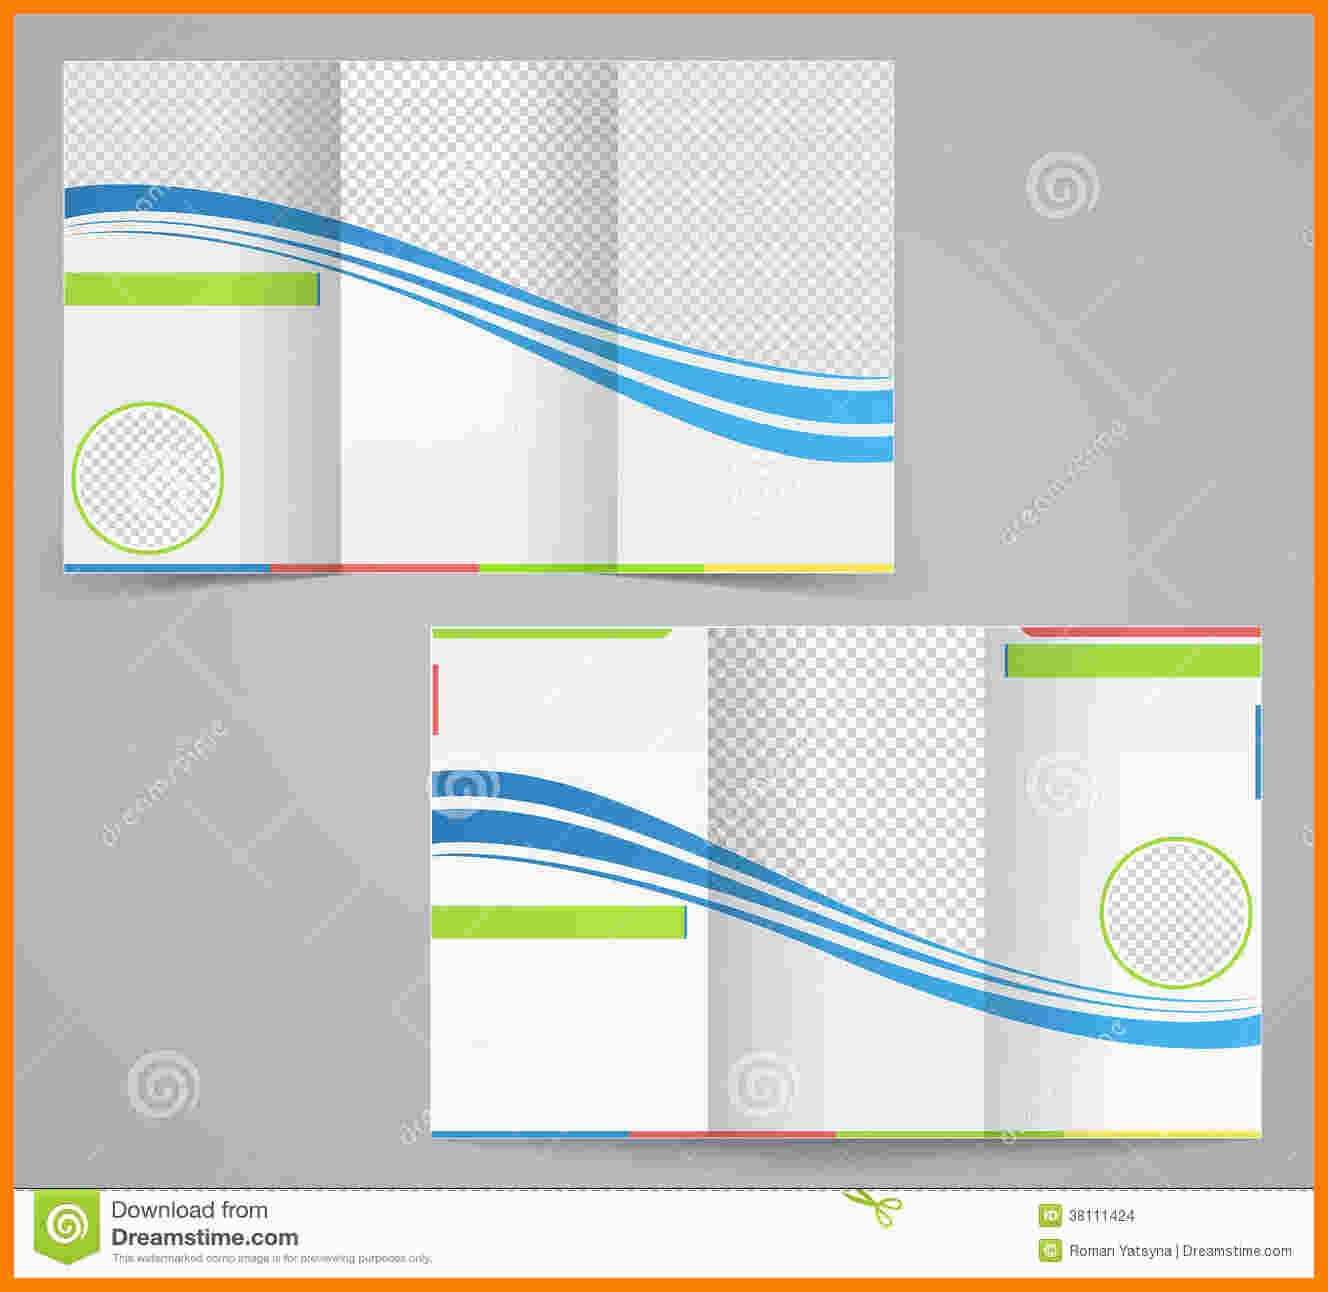 016 Free Tri Fold Brochure Templates Microsoft Word Download With Free Tri Fold Brochure Templates Microsoft Word